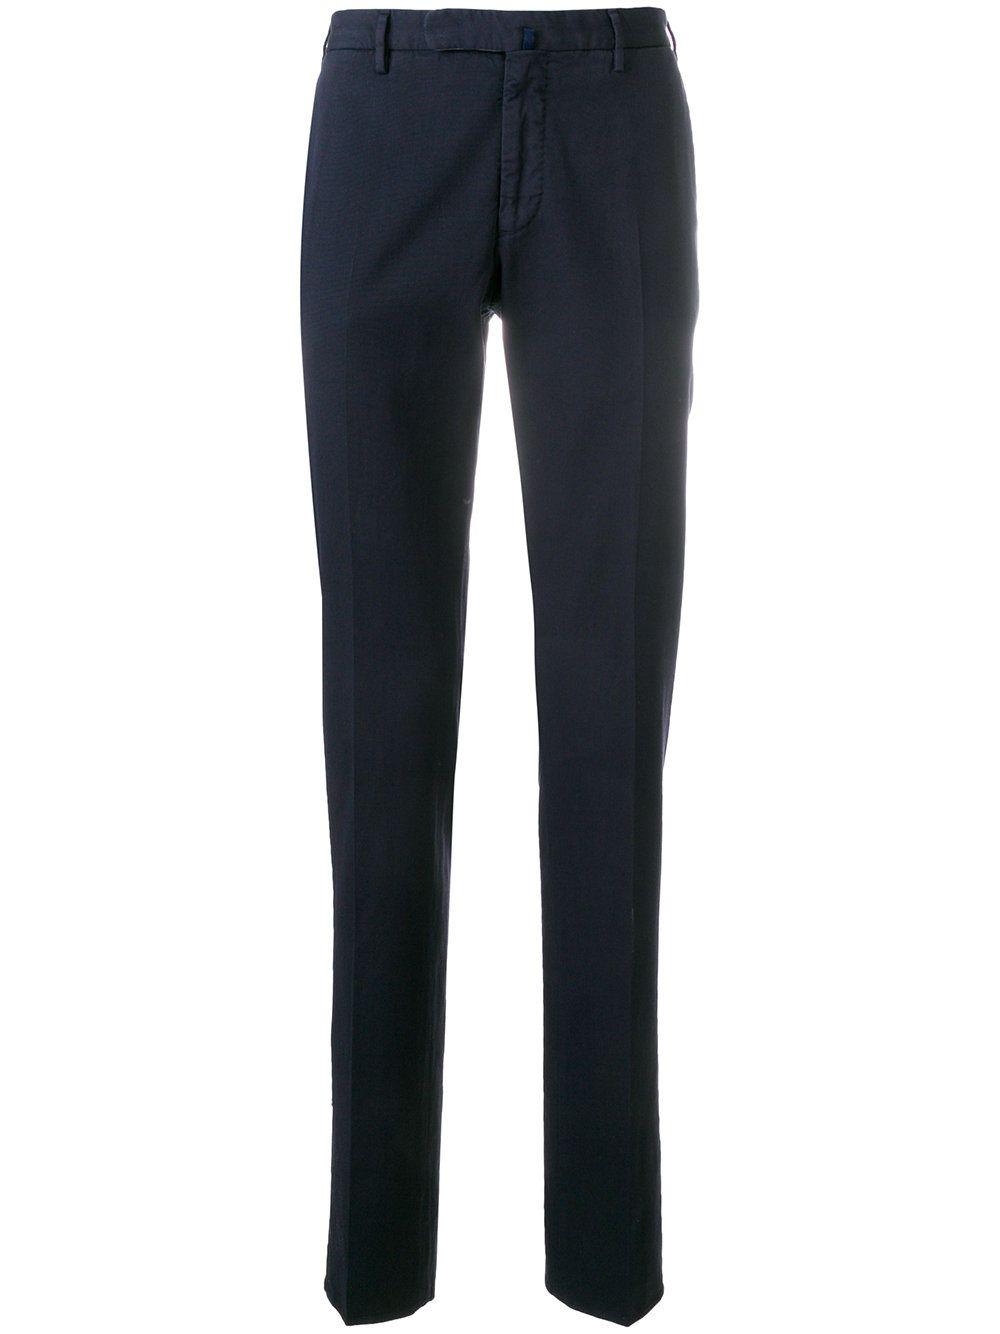 INCOTEX MEN'S 1AGW3090270822 BLUE COTTON PANTS